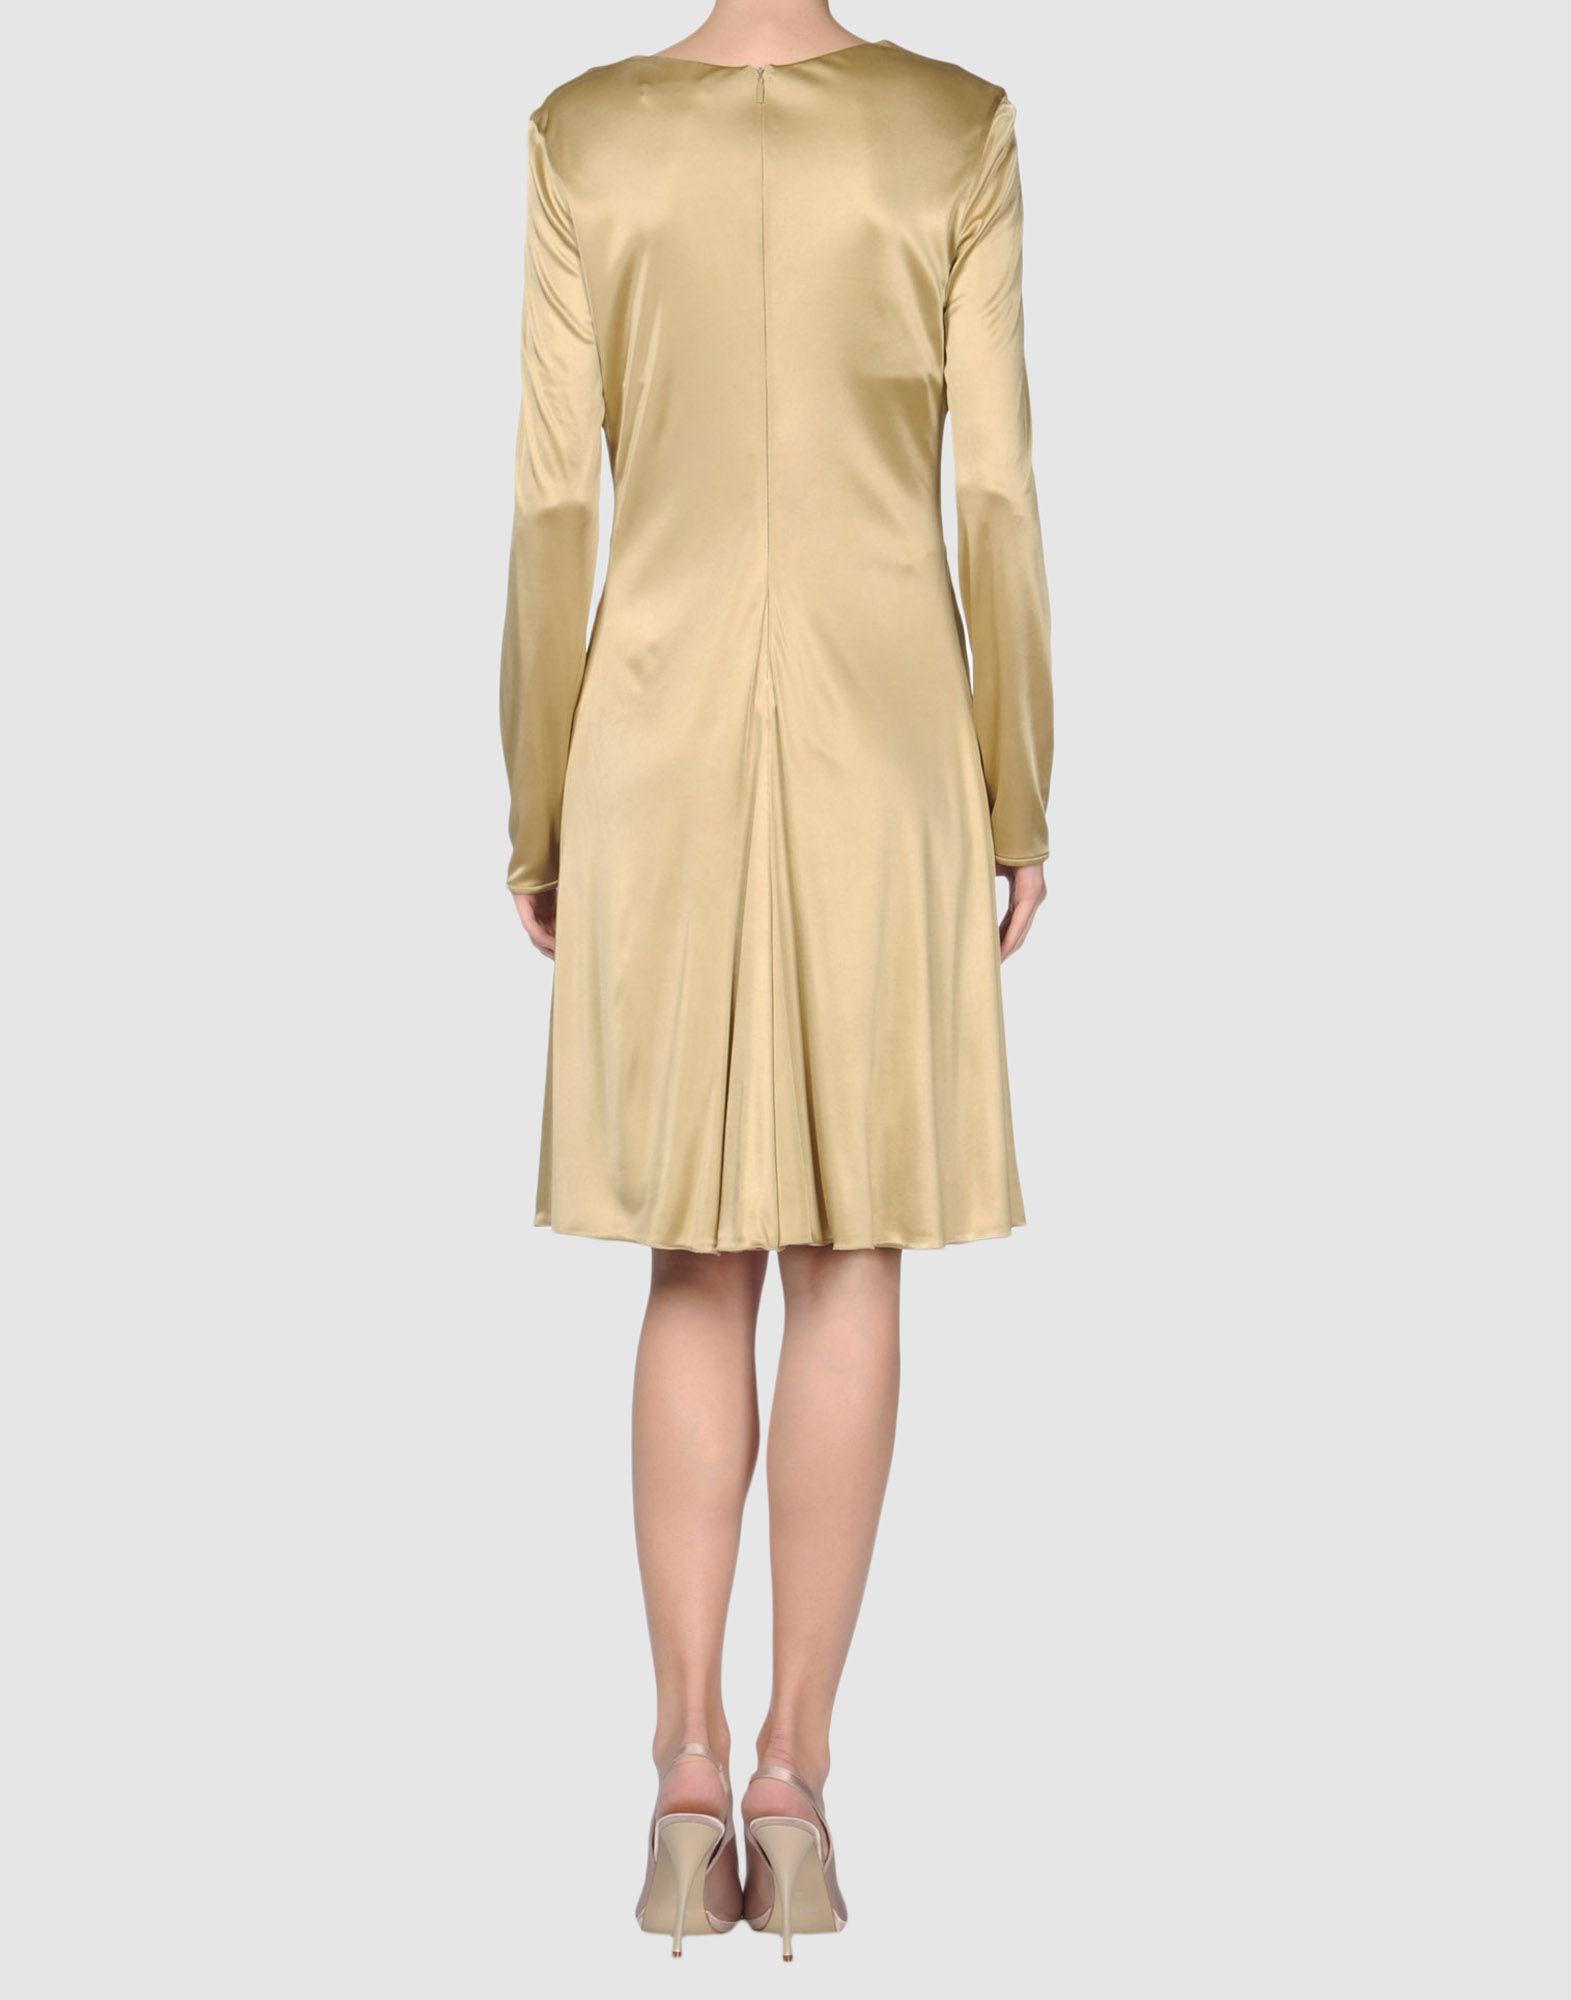 34224931WG 14 r - Evening Φορεματα Versace 2011 2012 Κωδ.02